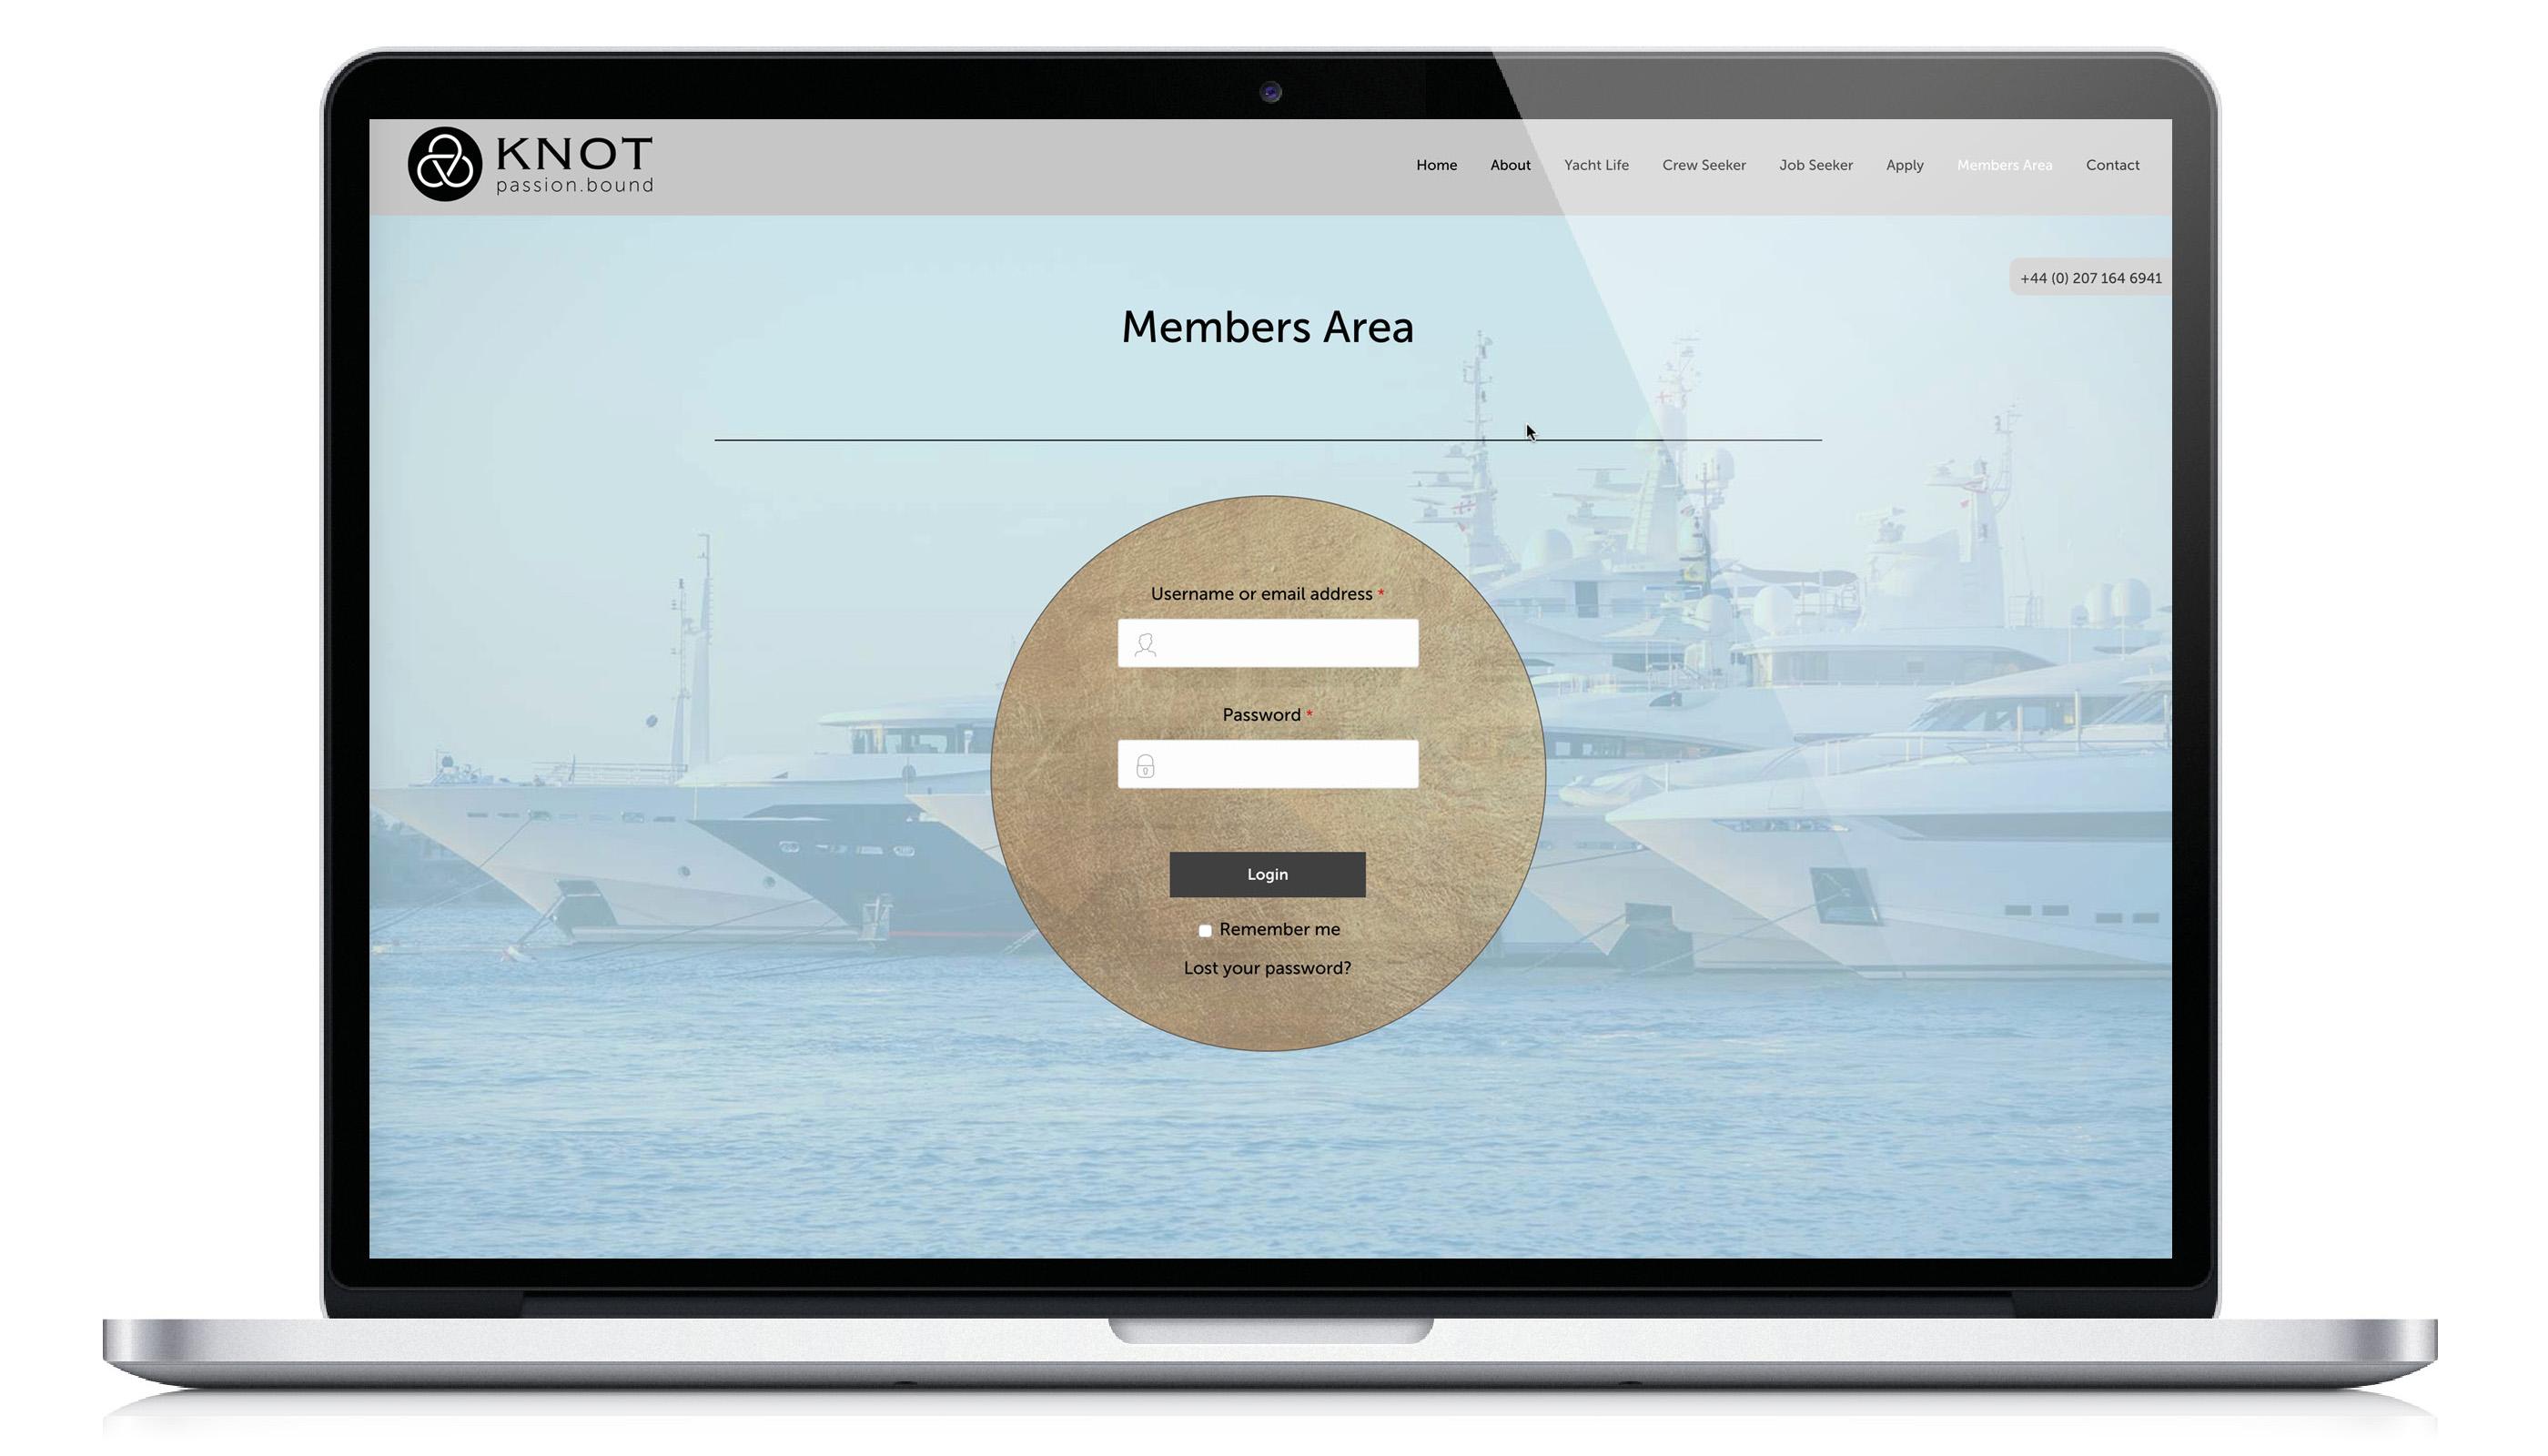 knot_webdesign_05